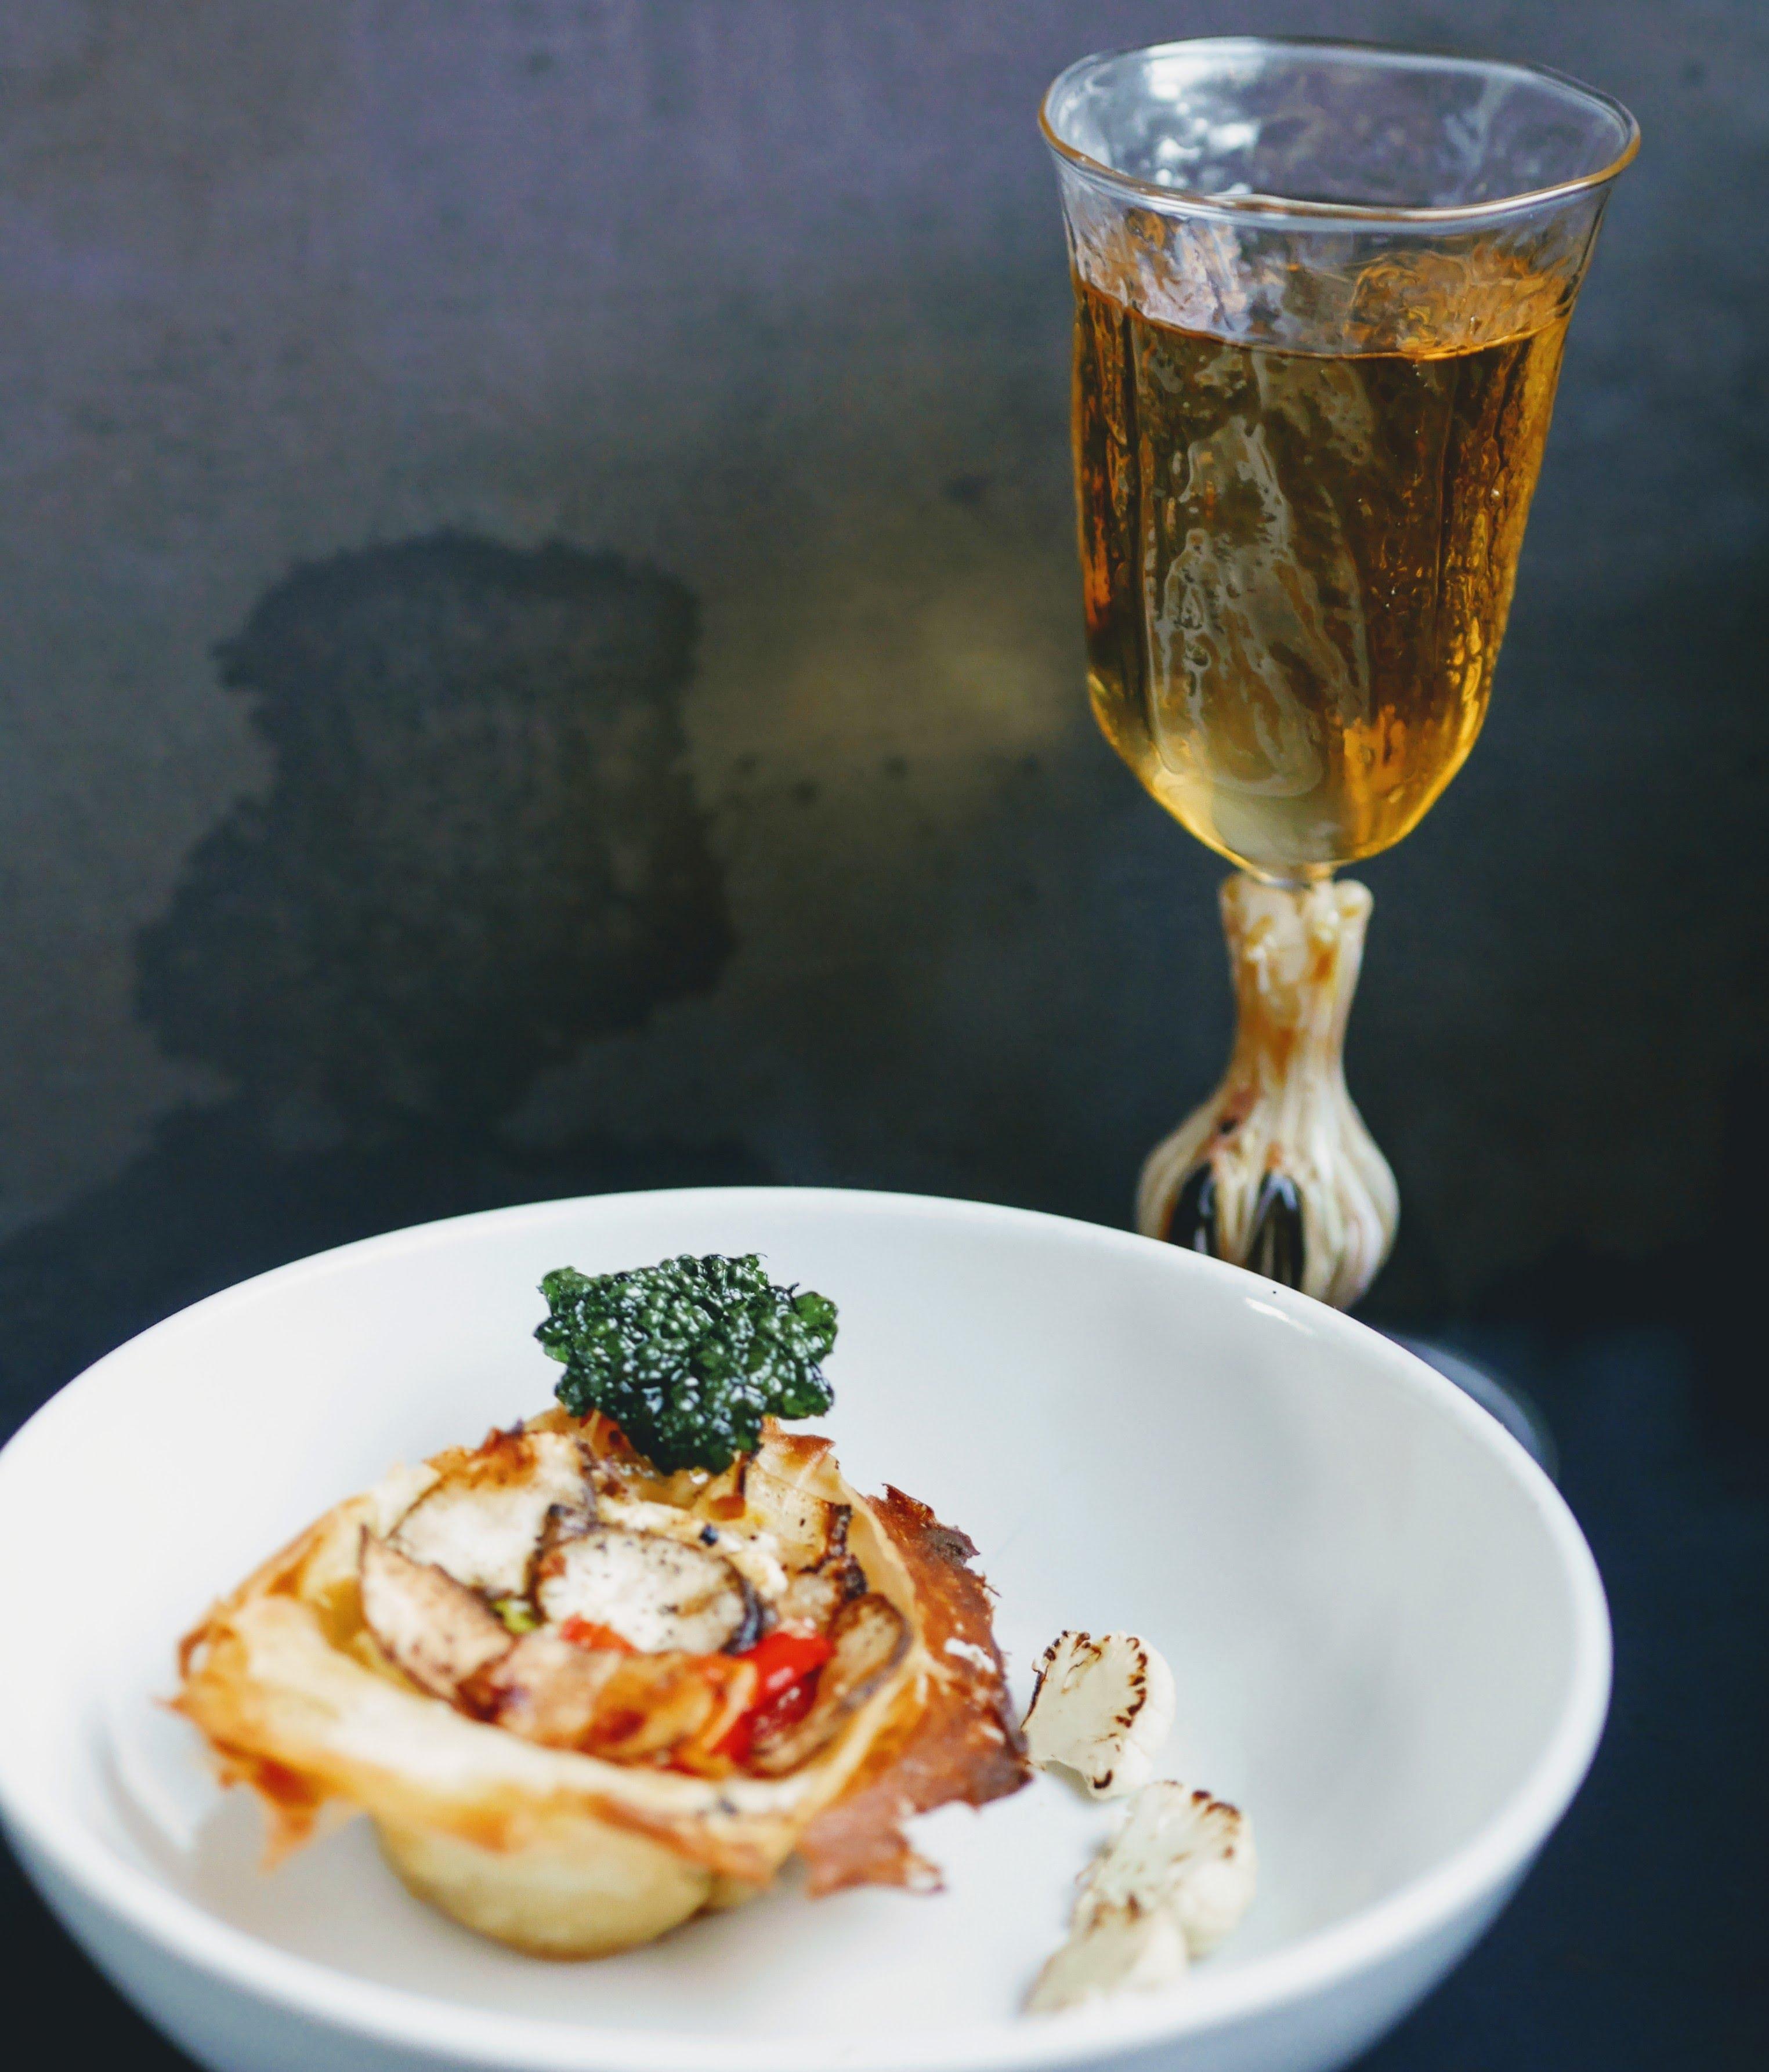 Black garlic stem wine glass